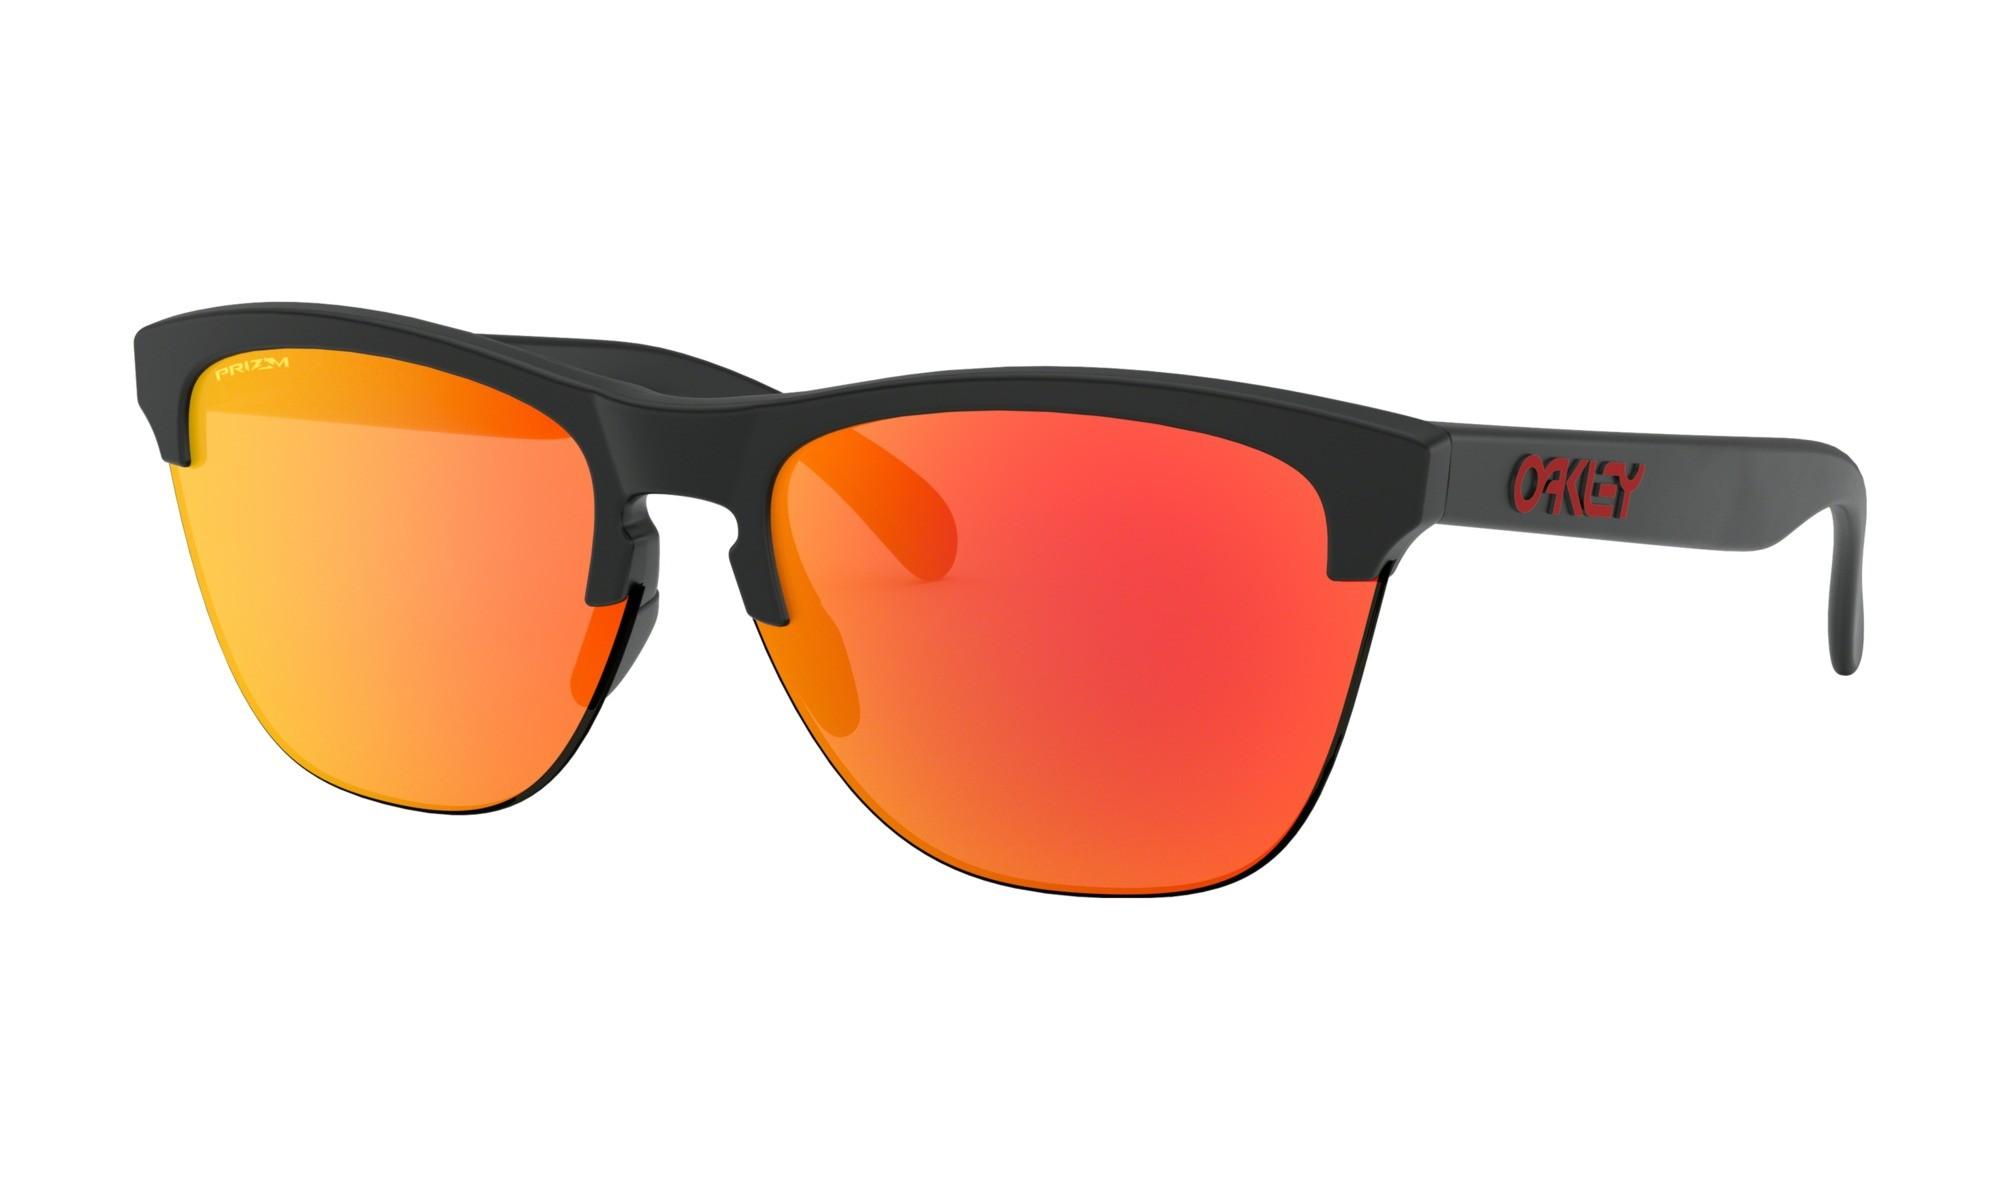 ad8d3454f3 Oakley Frogskins Lite Matte Black Prizm Ruby Sunglasses